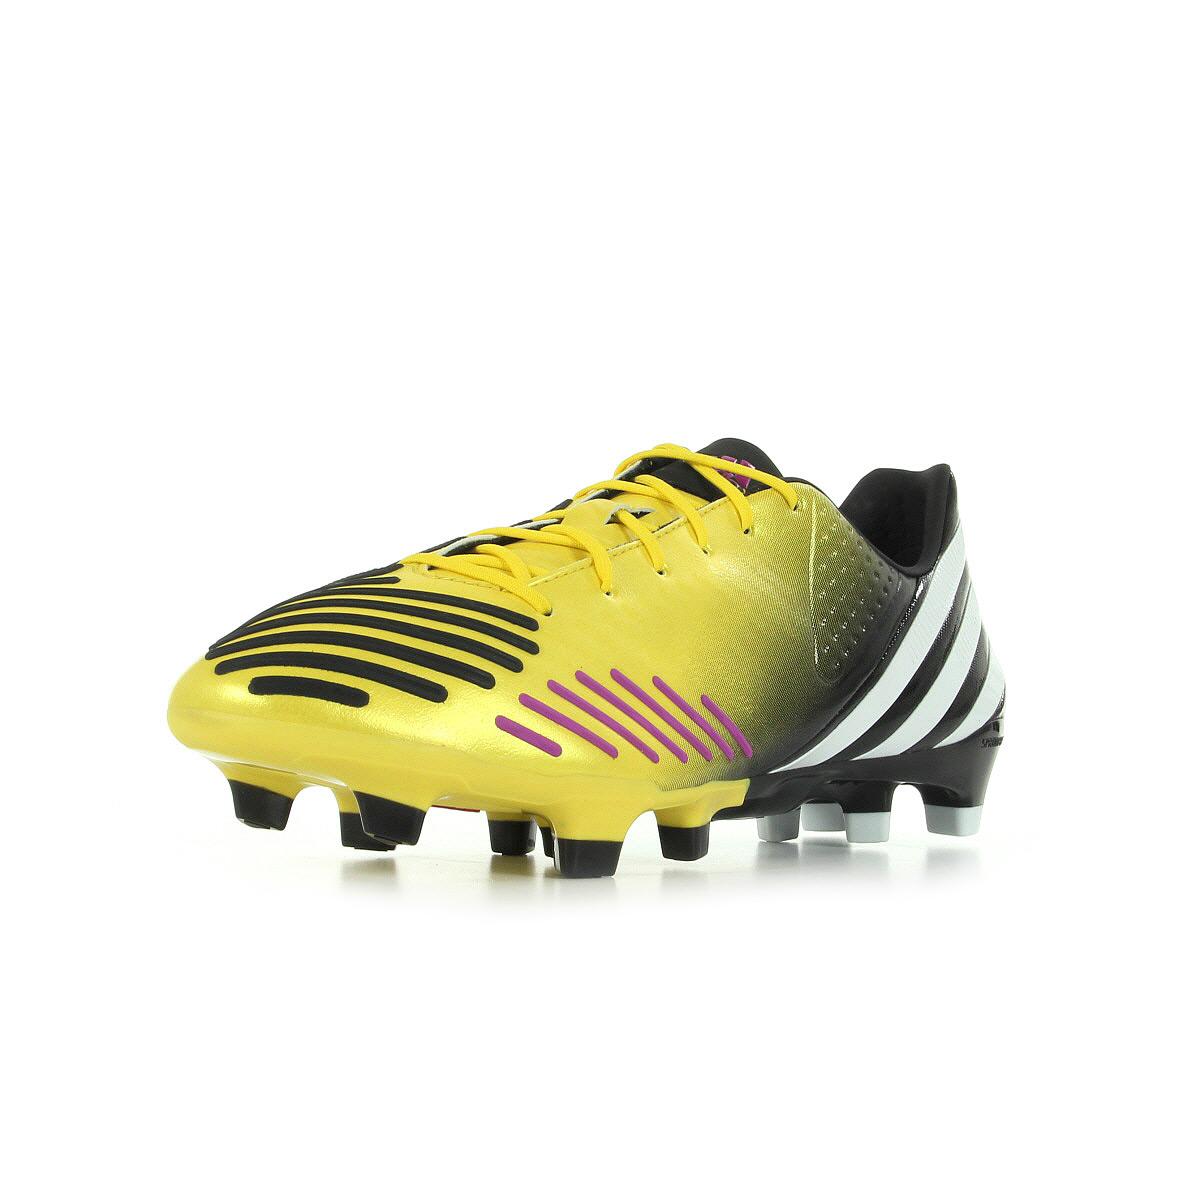 adidas chaussures de foot predator lz trx fg homme